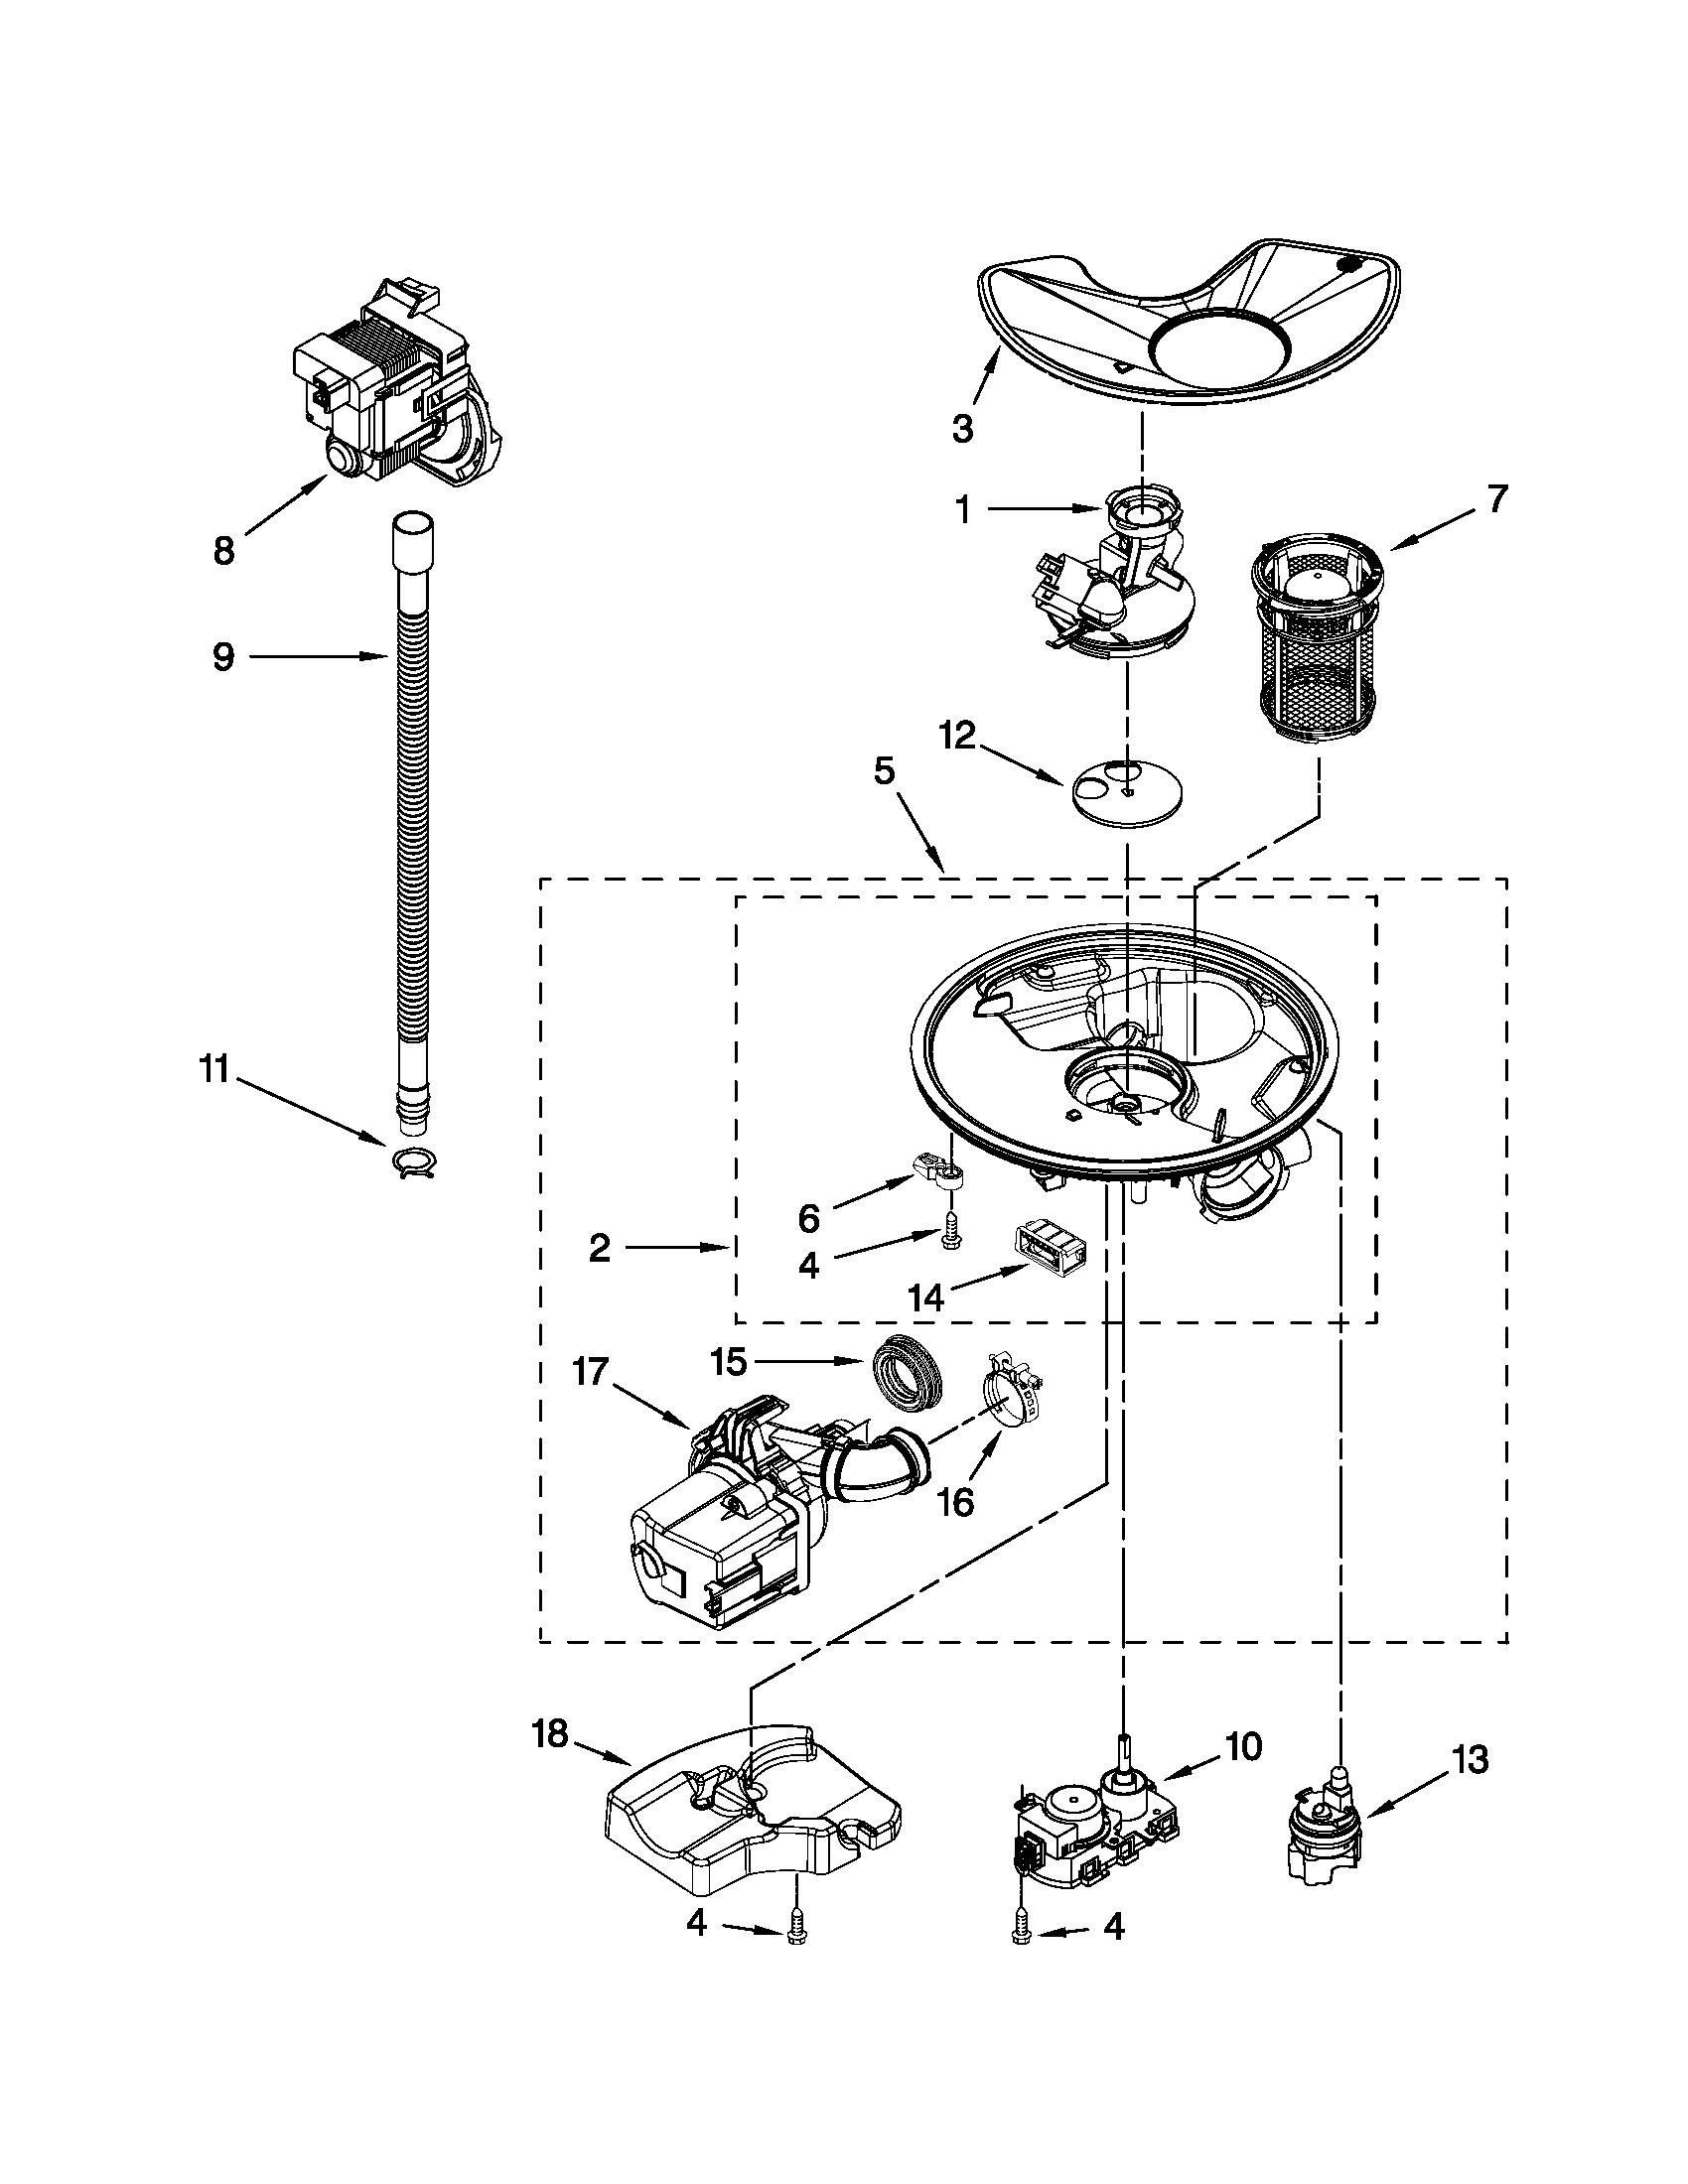 sears model 110 parts diagram 1987 bayliner capri wiring kenmore undercounter dishwasher 66513293k110